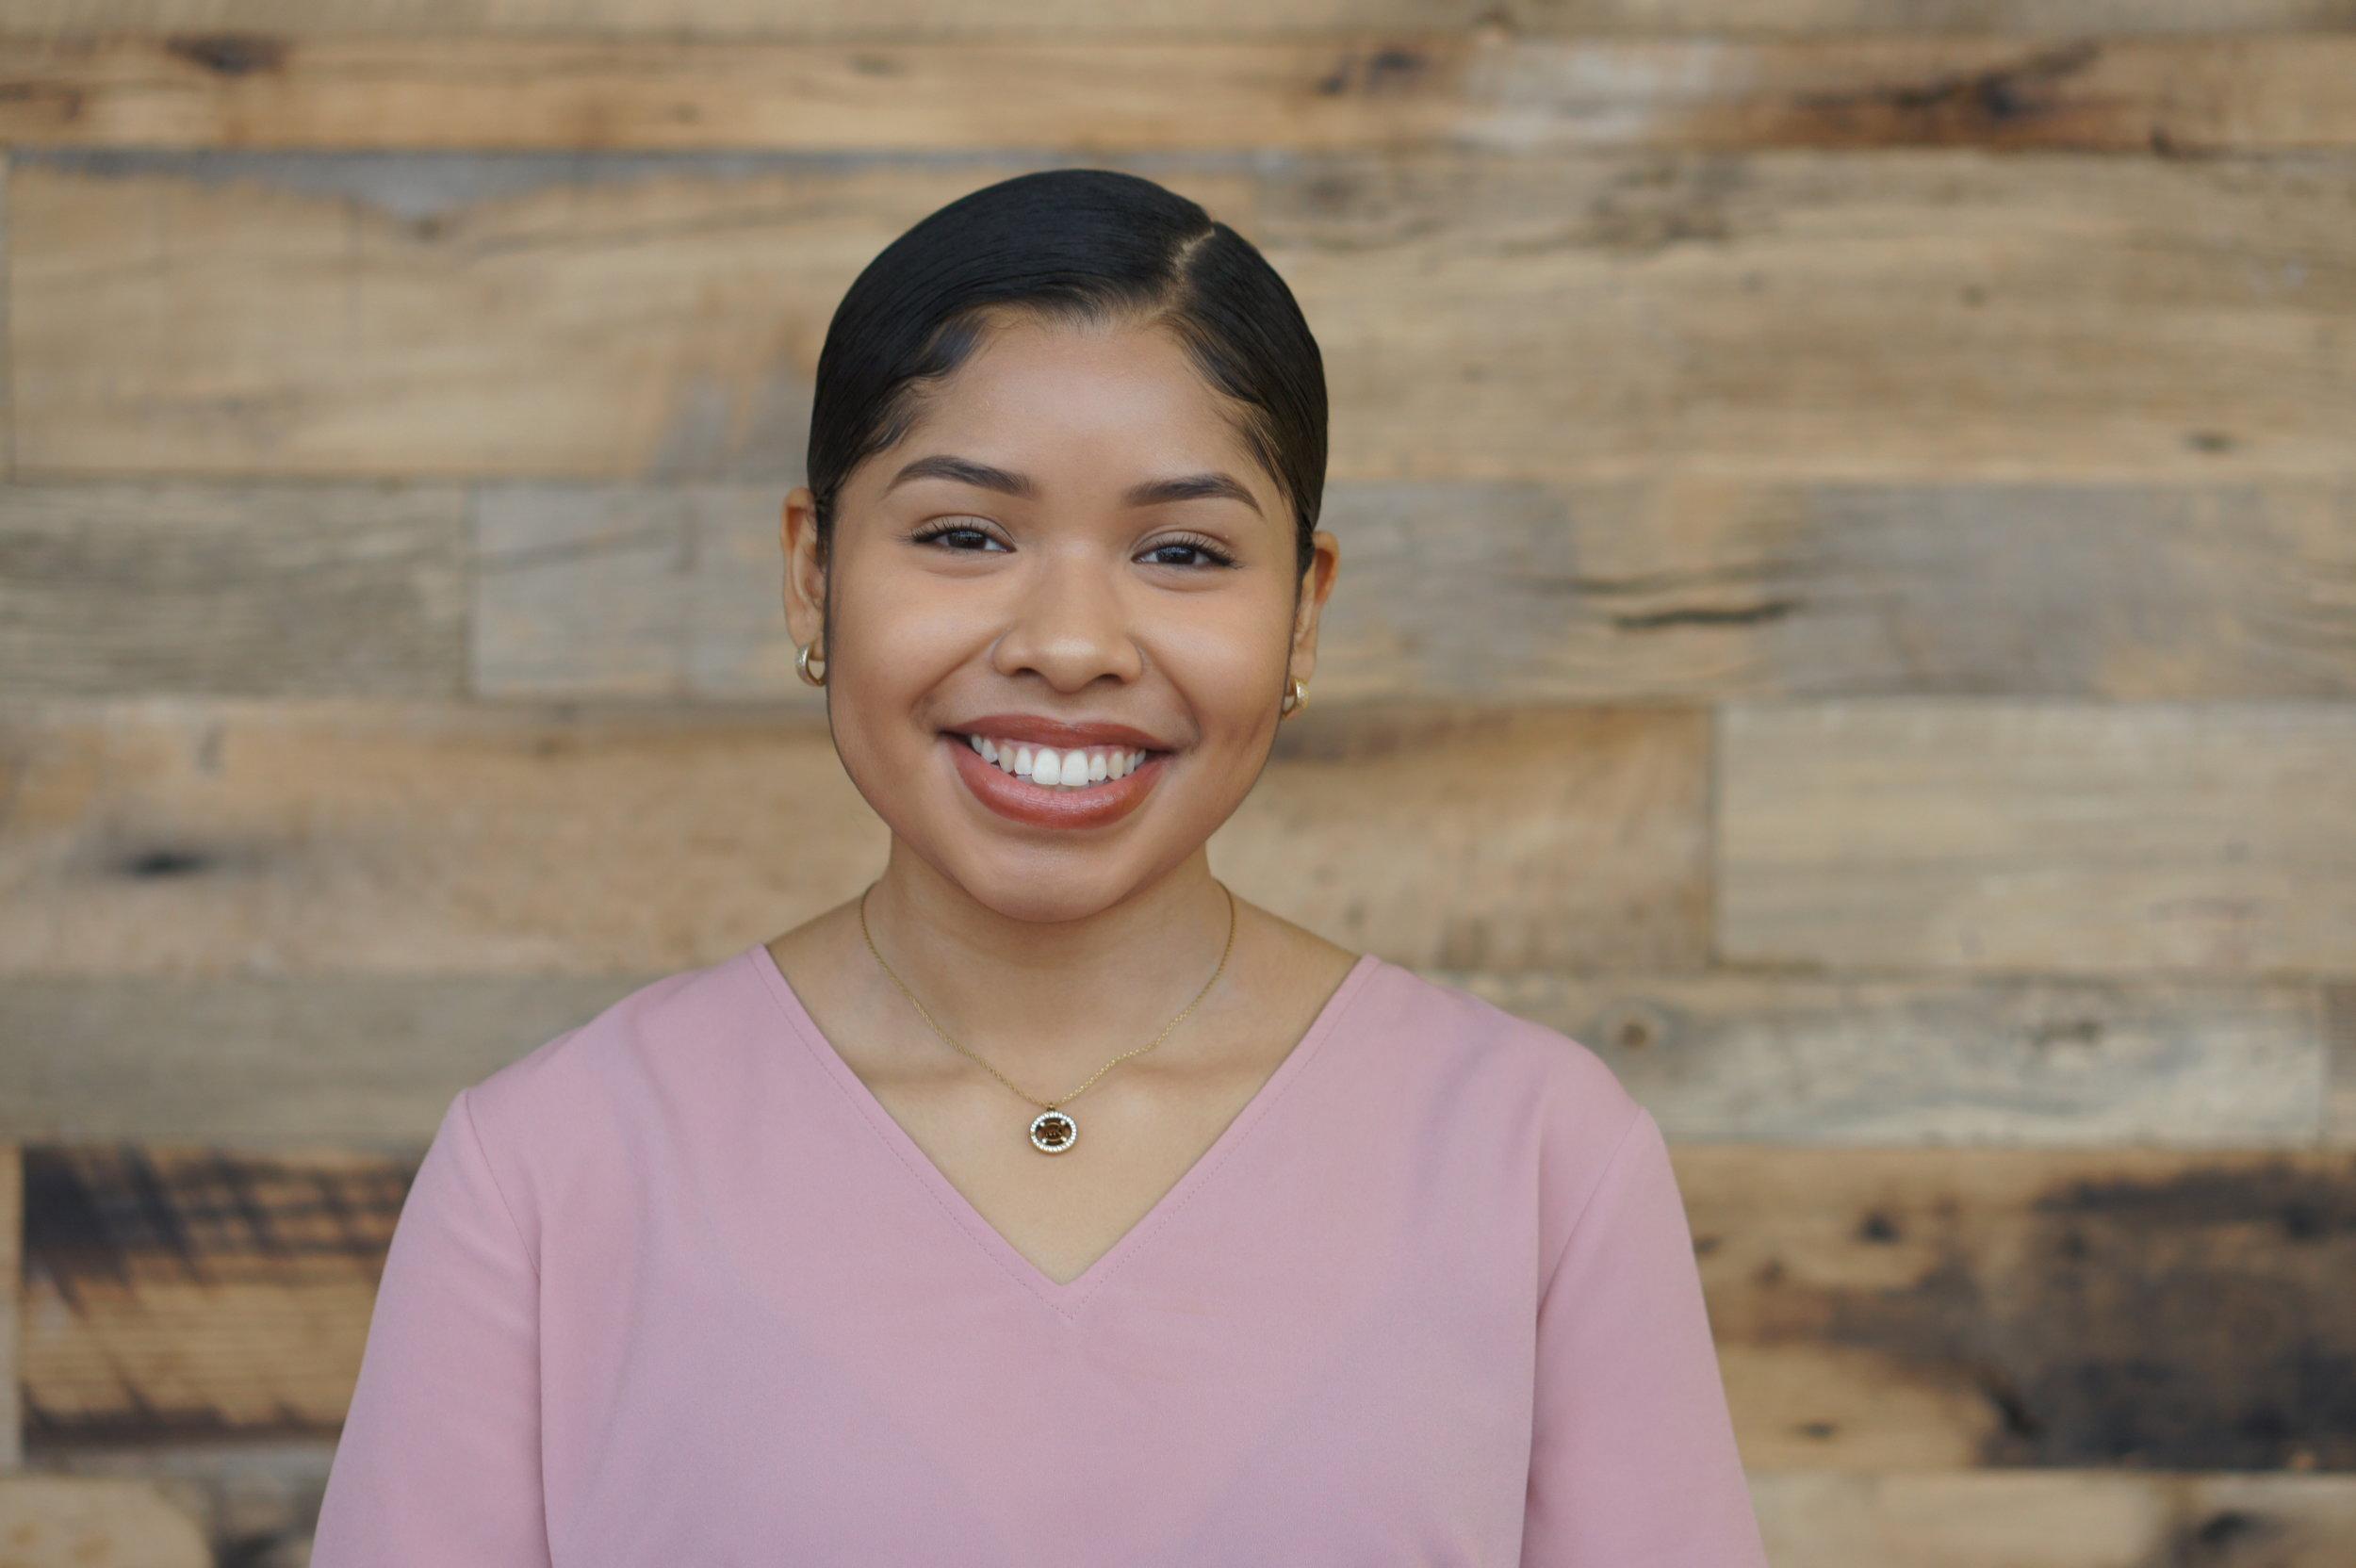 Gina Guzman Cisneros  Physical Therapy, Freshman University of North Carolina at Chapel Hill  PepsiCo Scholarship